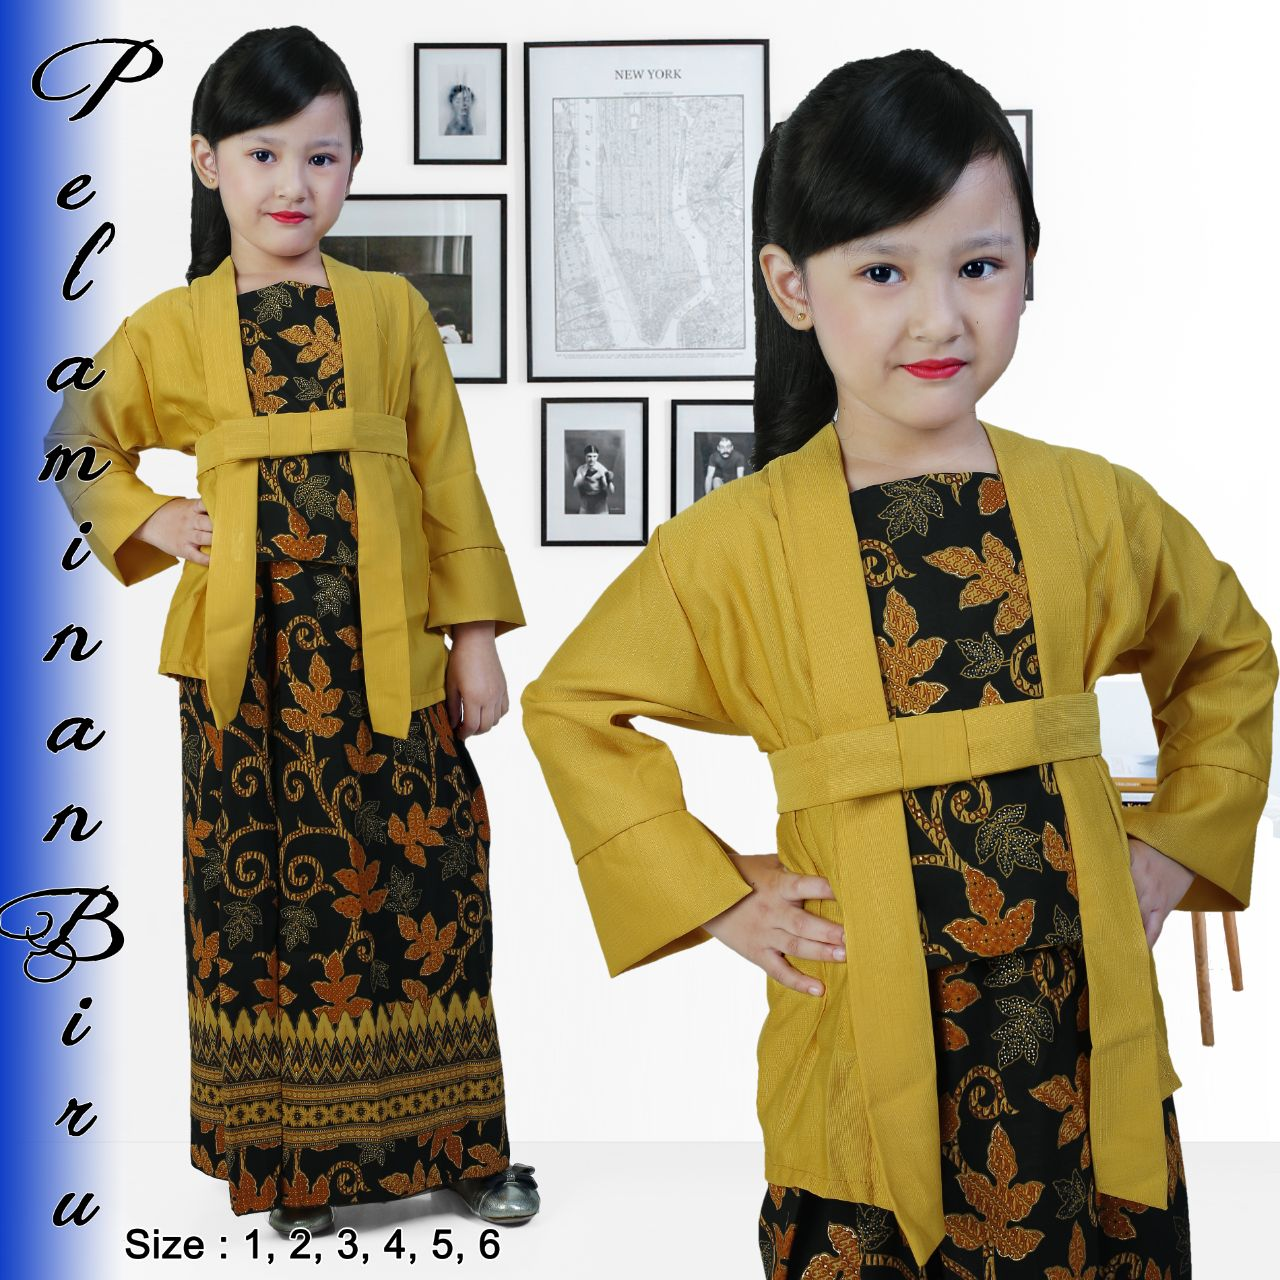 New fashion !!! kebaya kutubaru elnira anak / kebaya anak modern / kebaya tradittional / kebaya wisuda / kebaya kartini